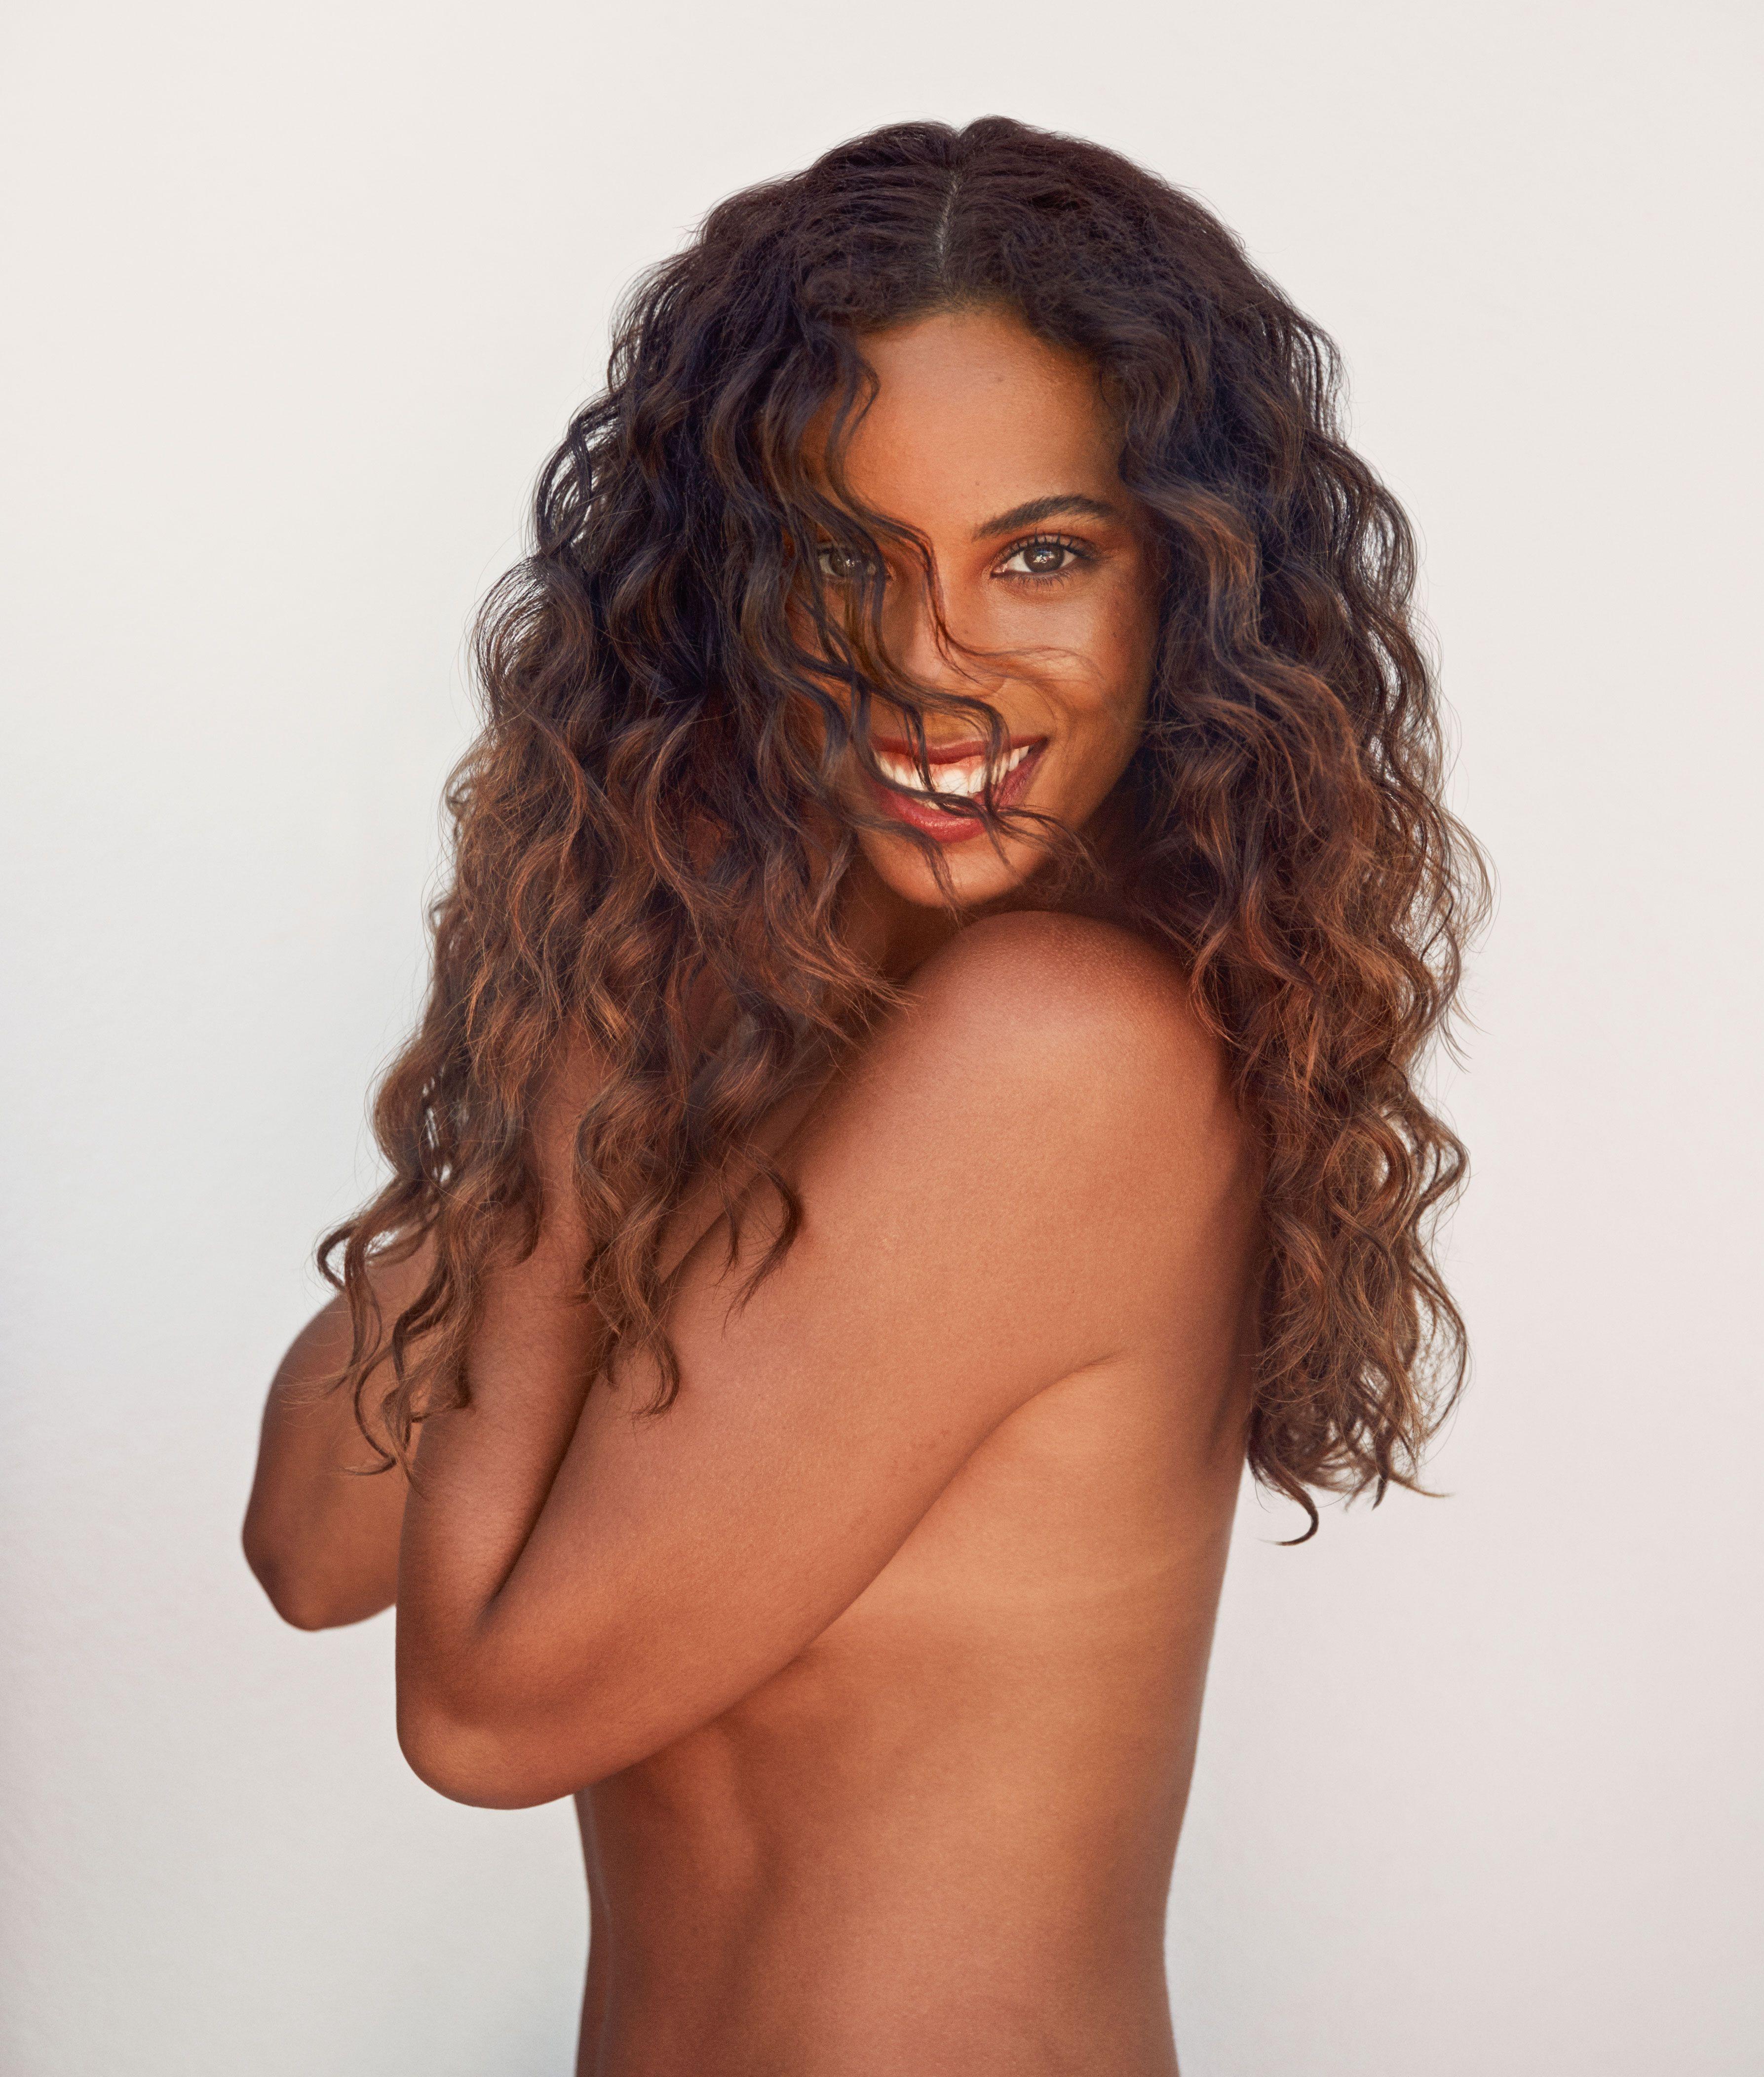 Topless Body photo 25